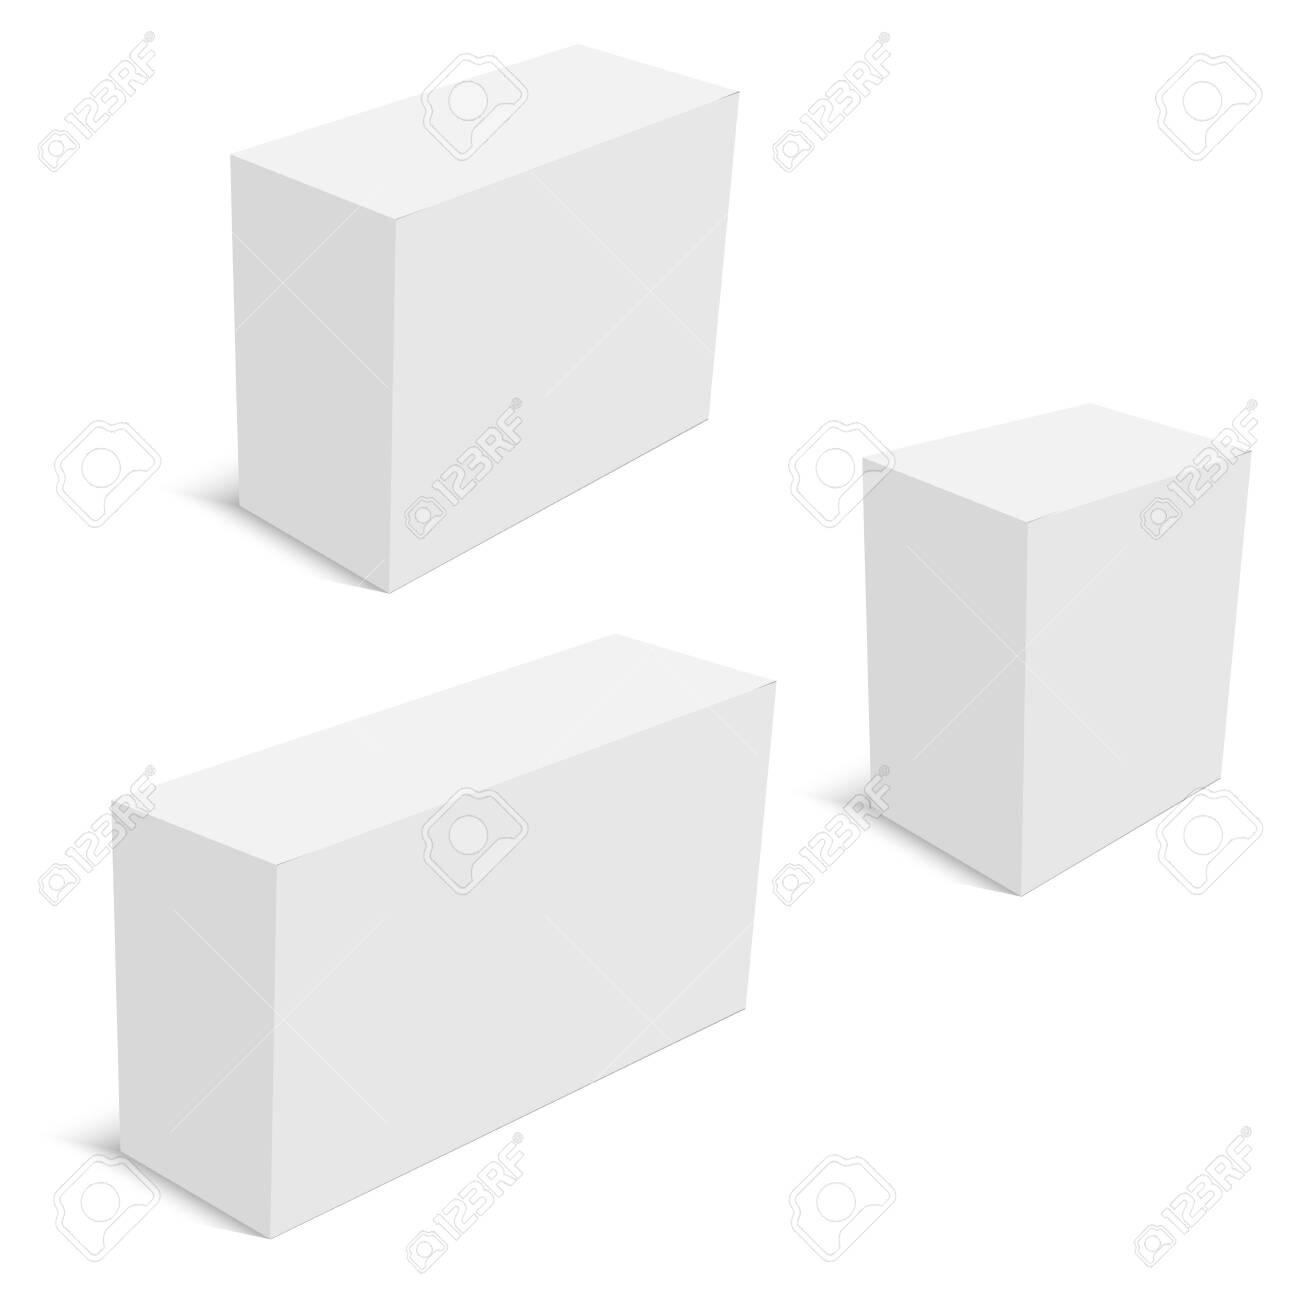 Realistic cardboard packaging boxes mockup. Vector - 151474635